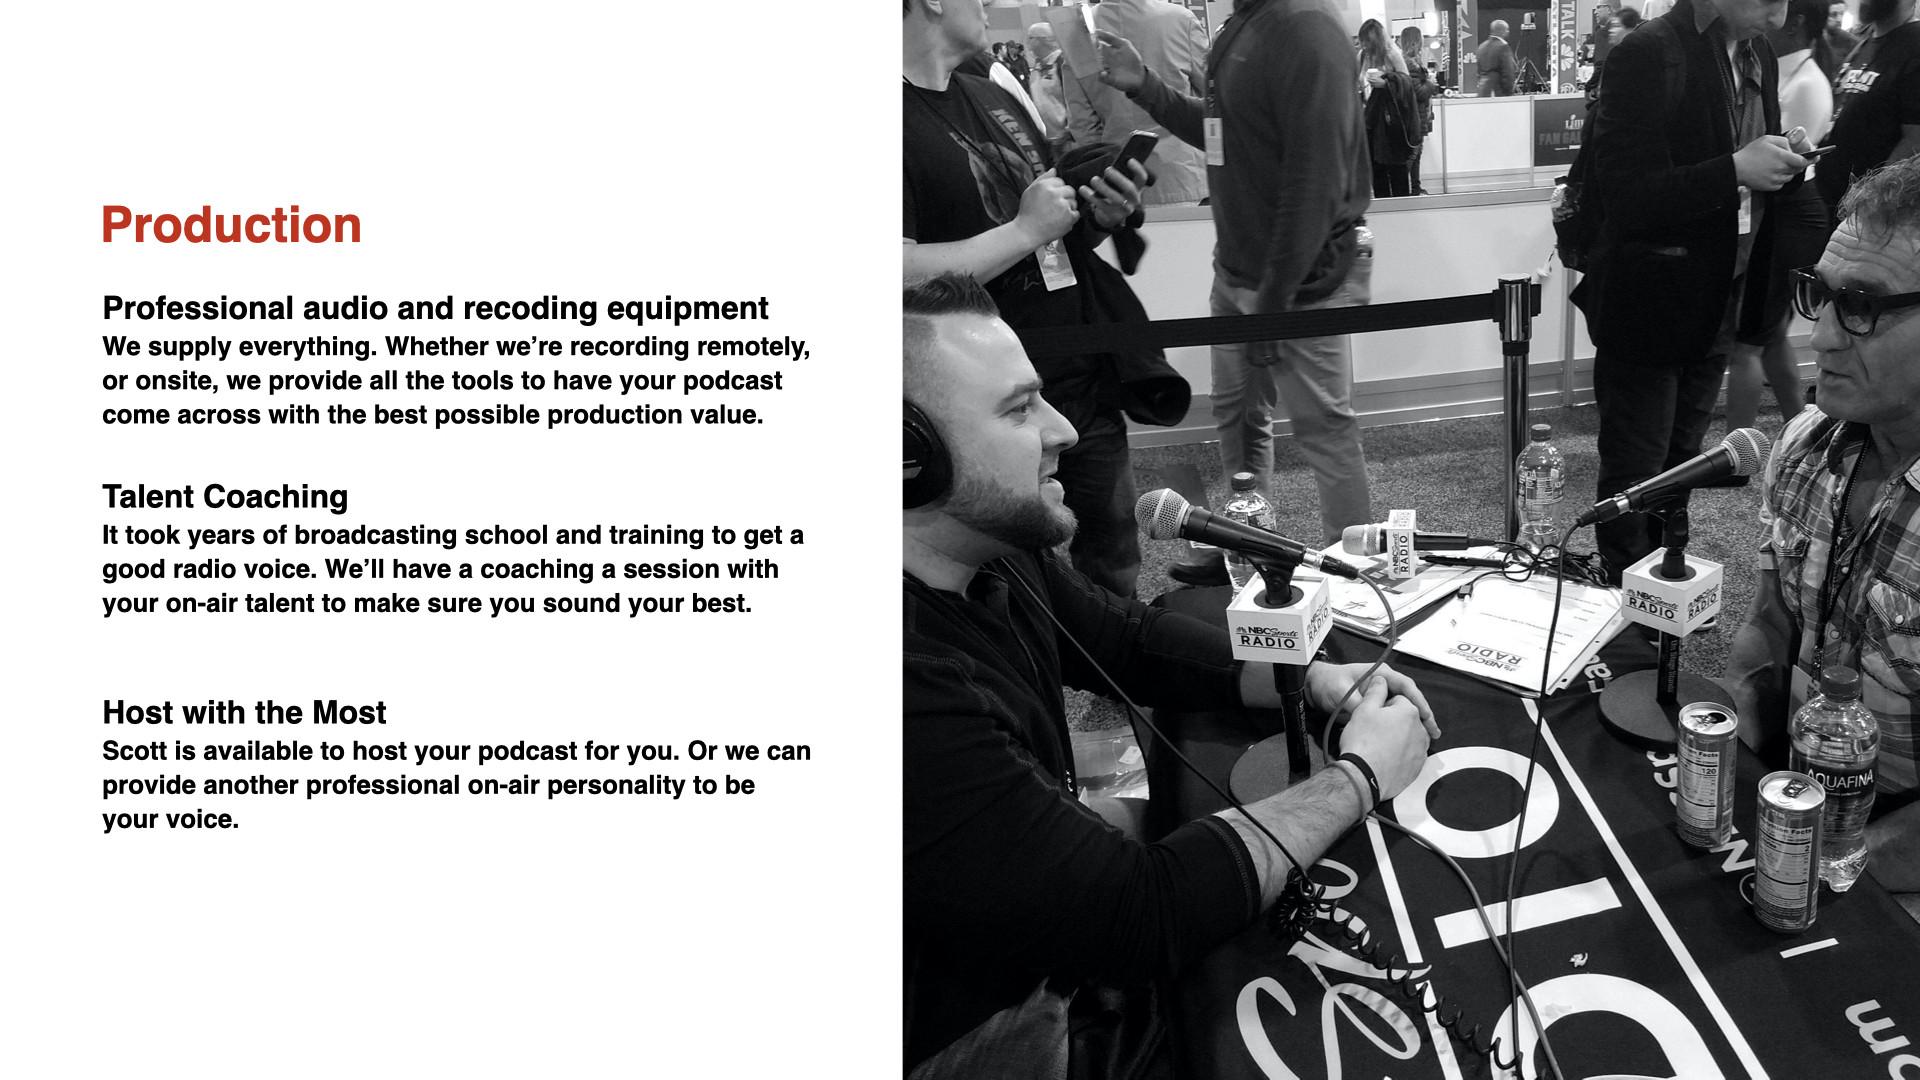 ScottsOnAir Podcast Proposal Images.009.